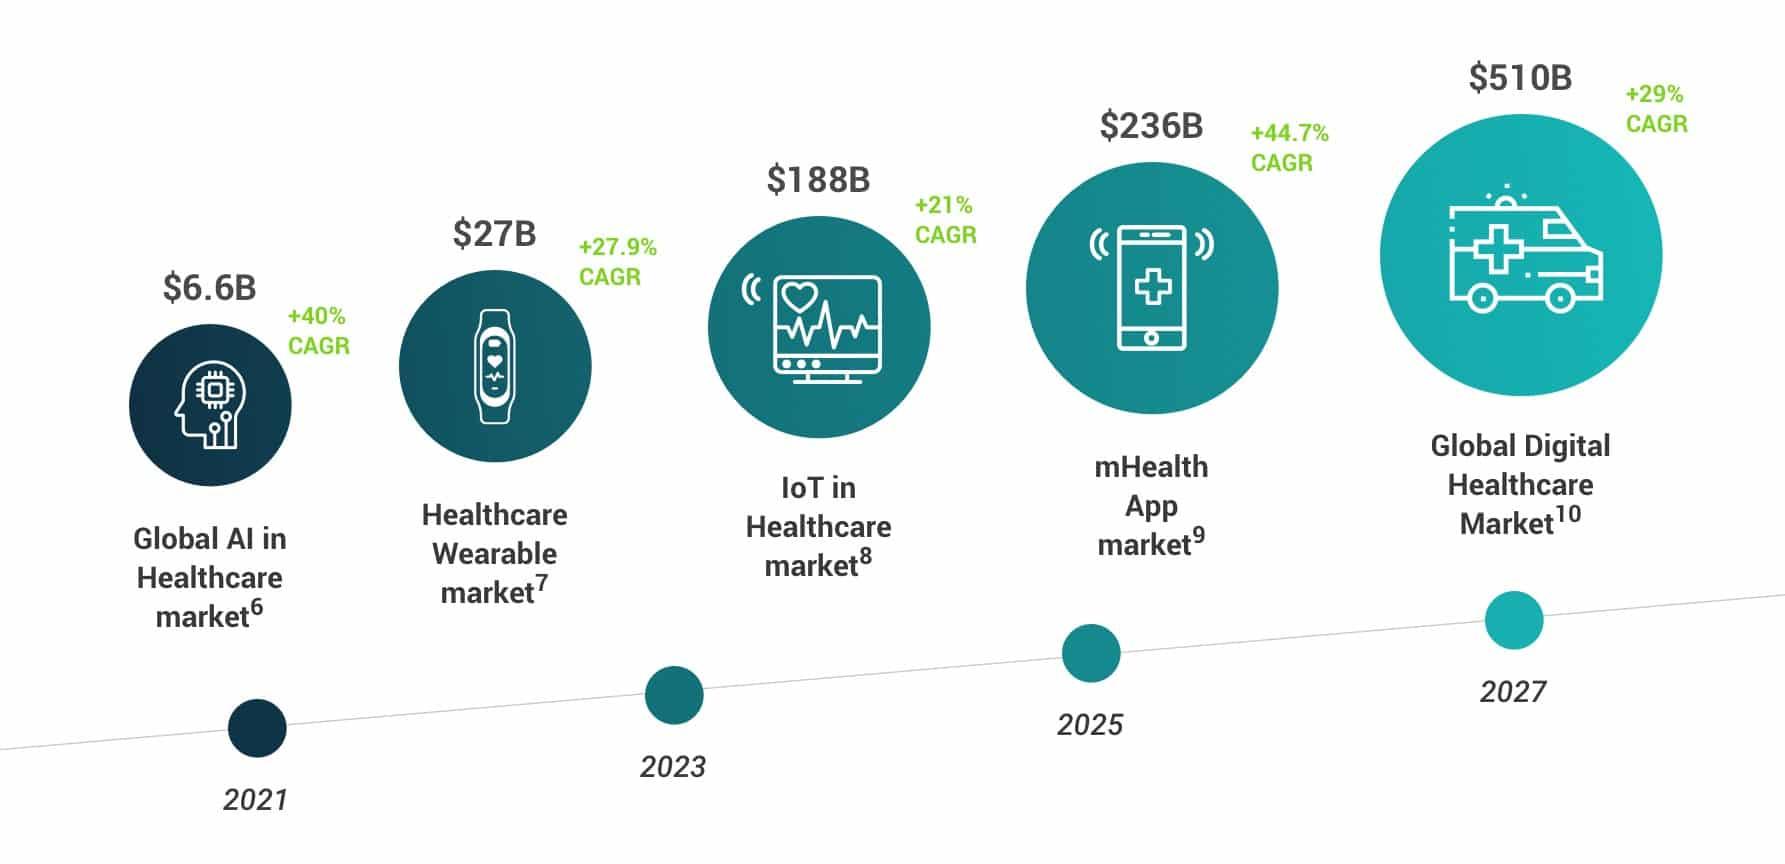 digital-healthcare-market-trends-2020-edge-iot